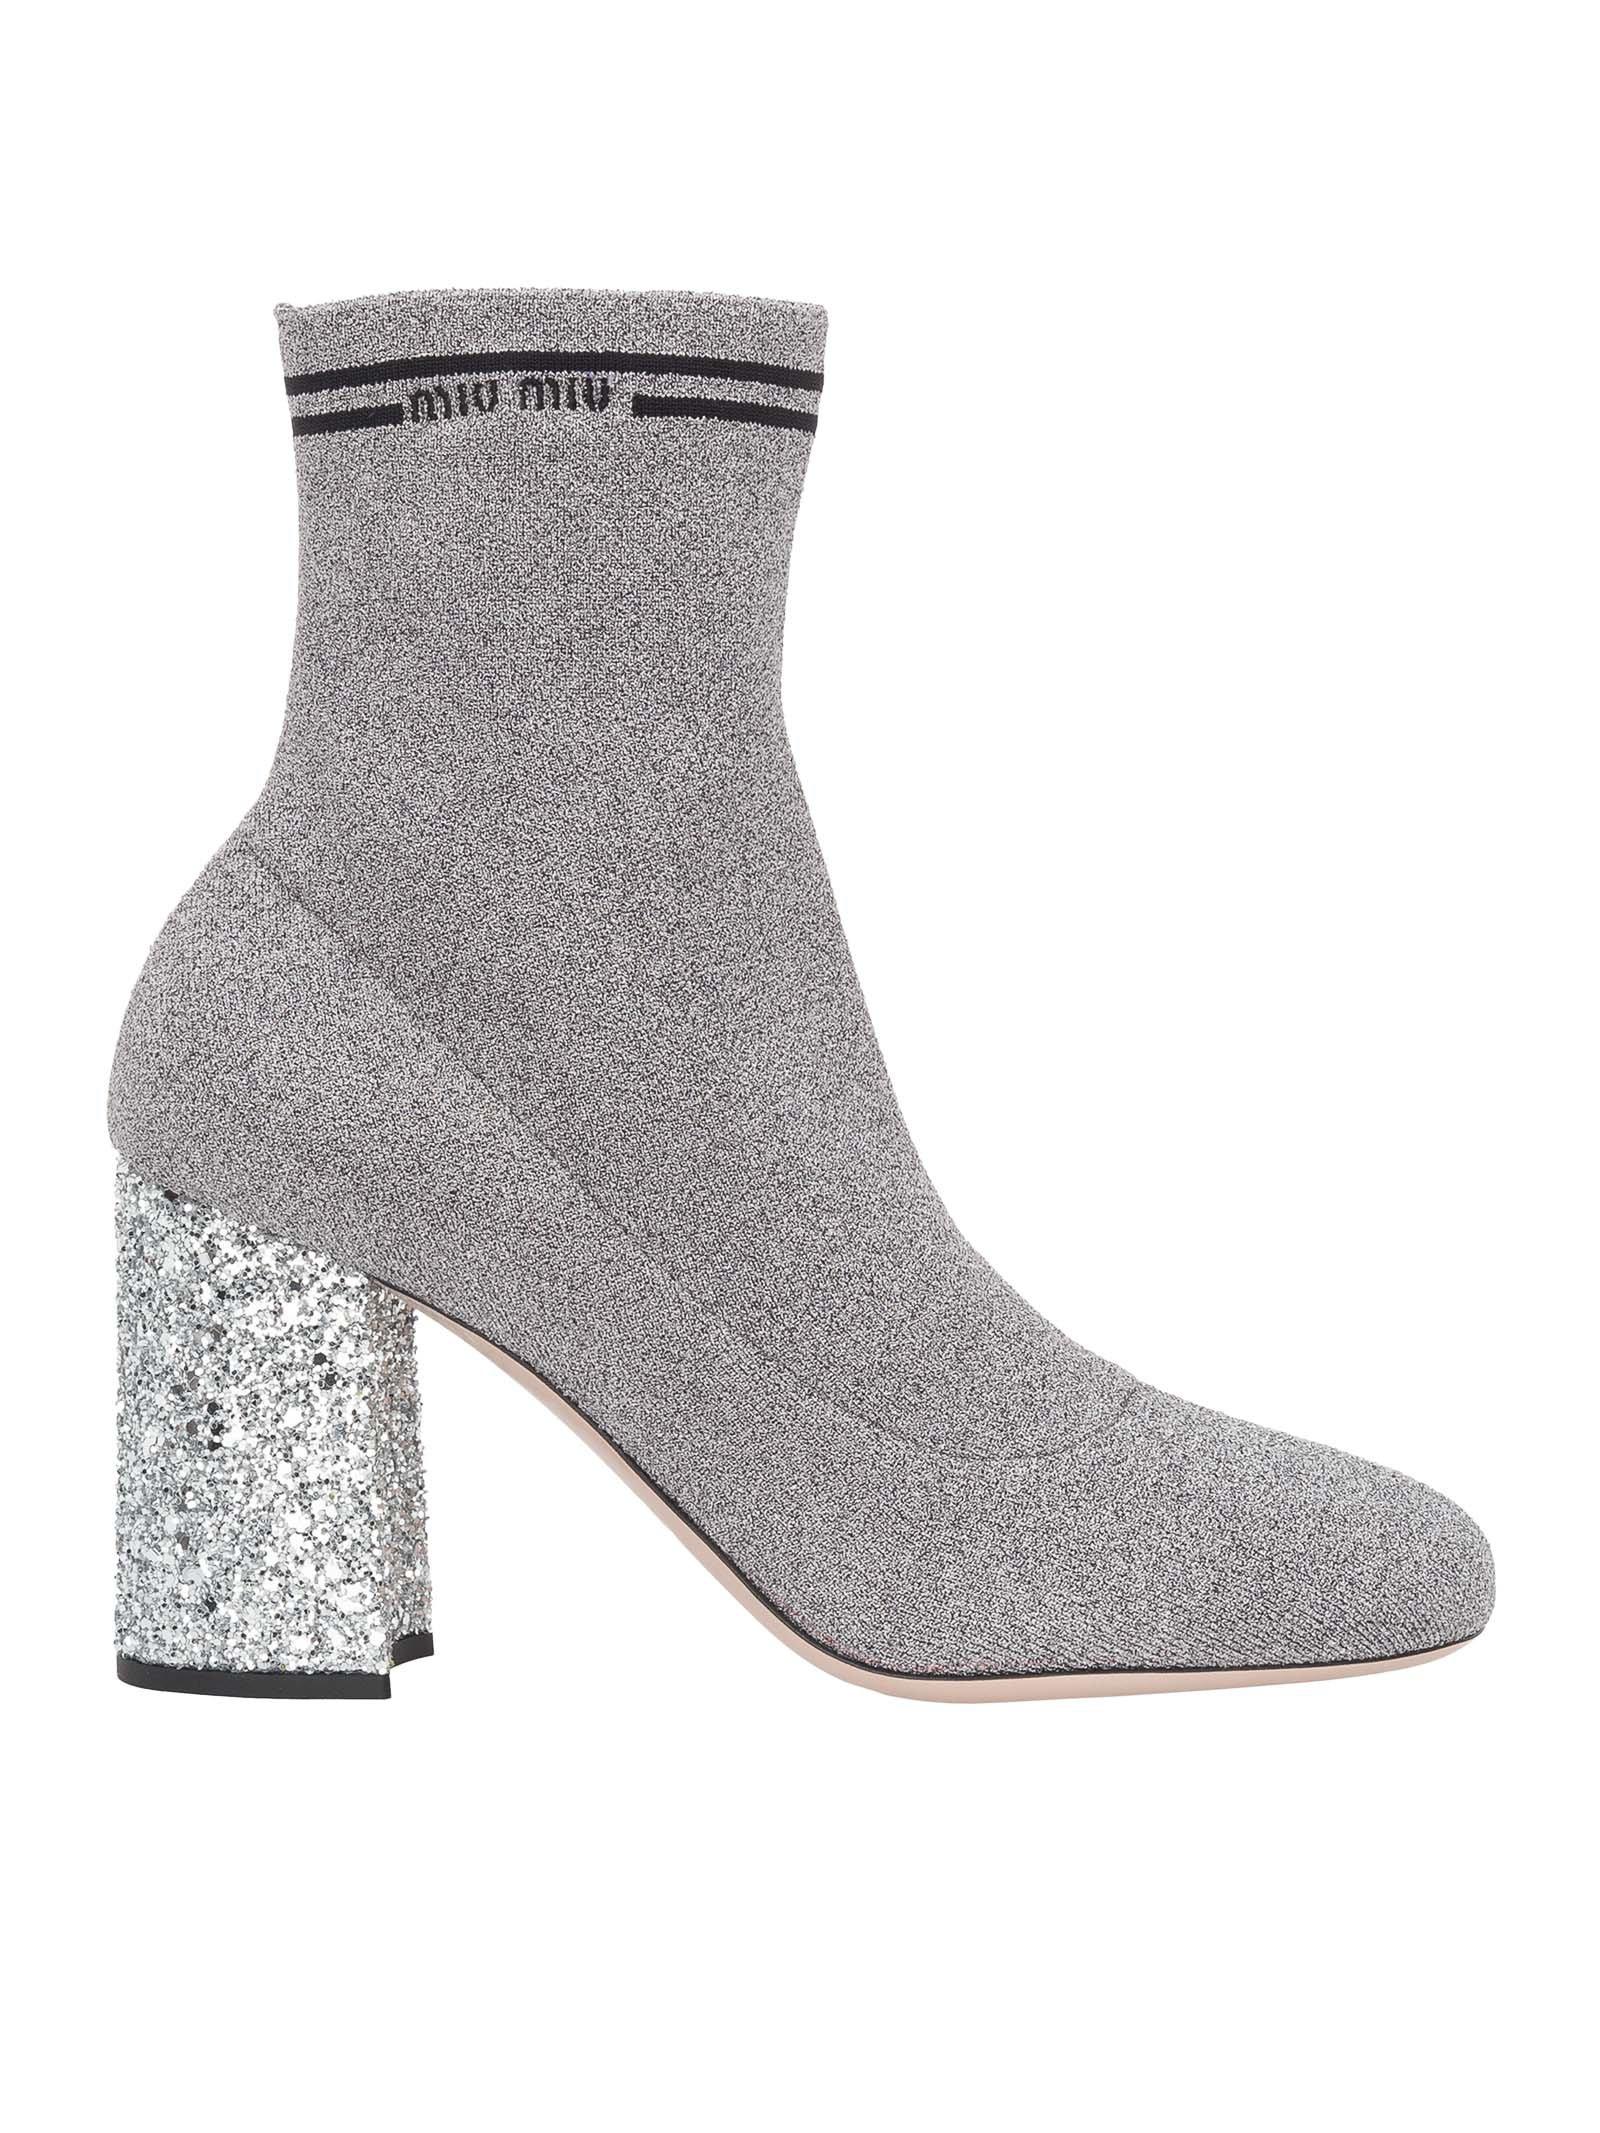 Miu Miu Sock Ankle Boot